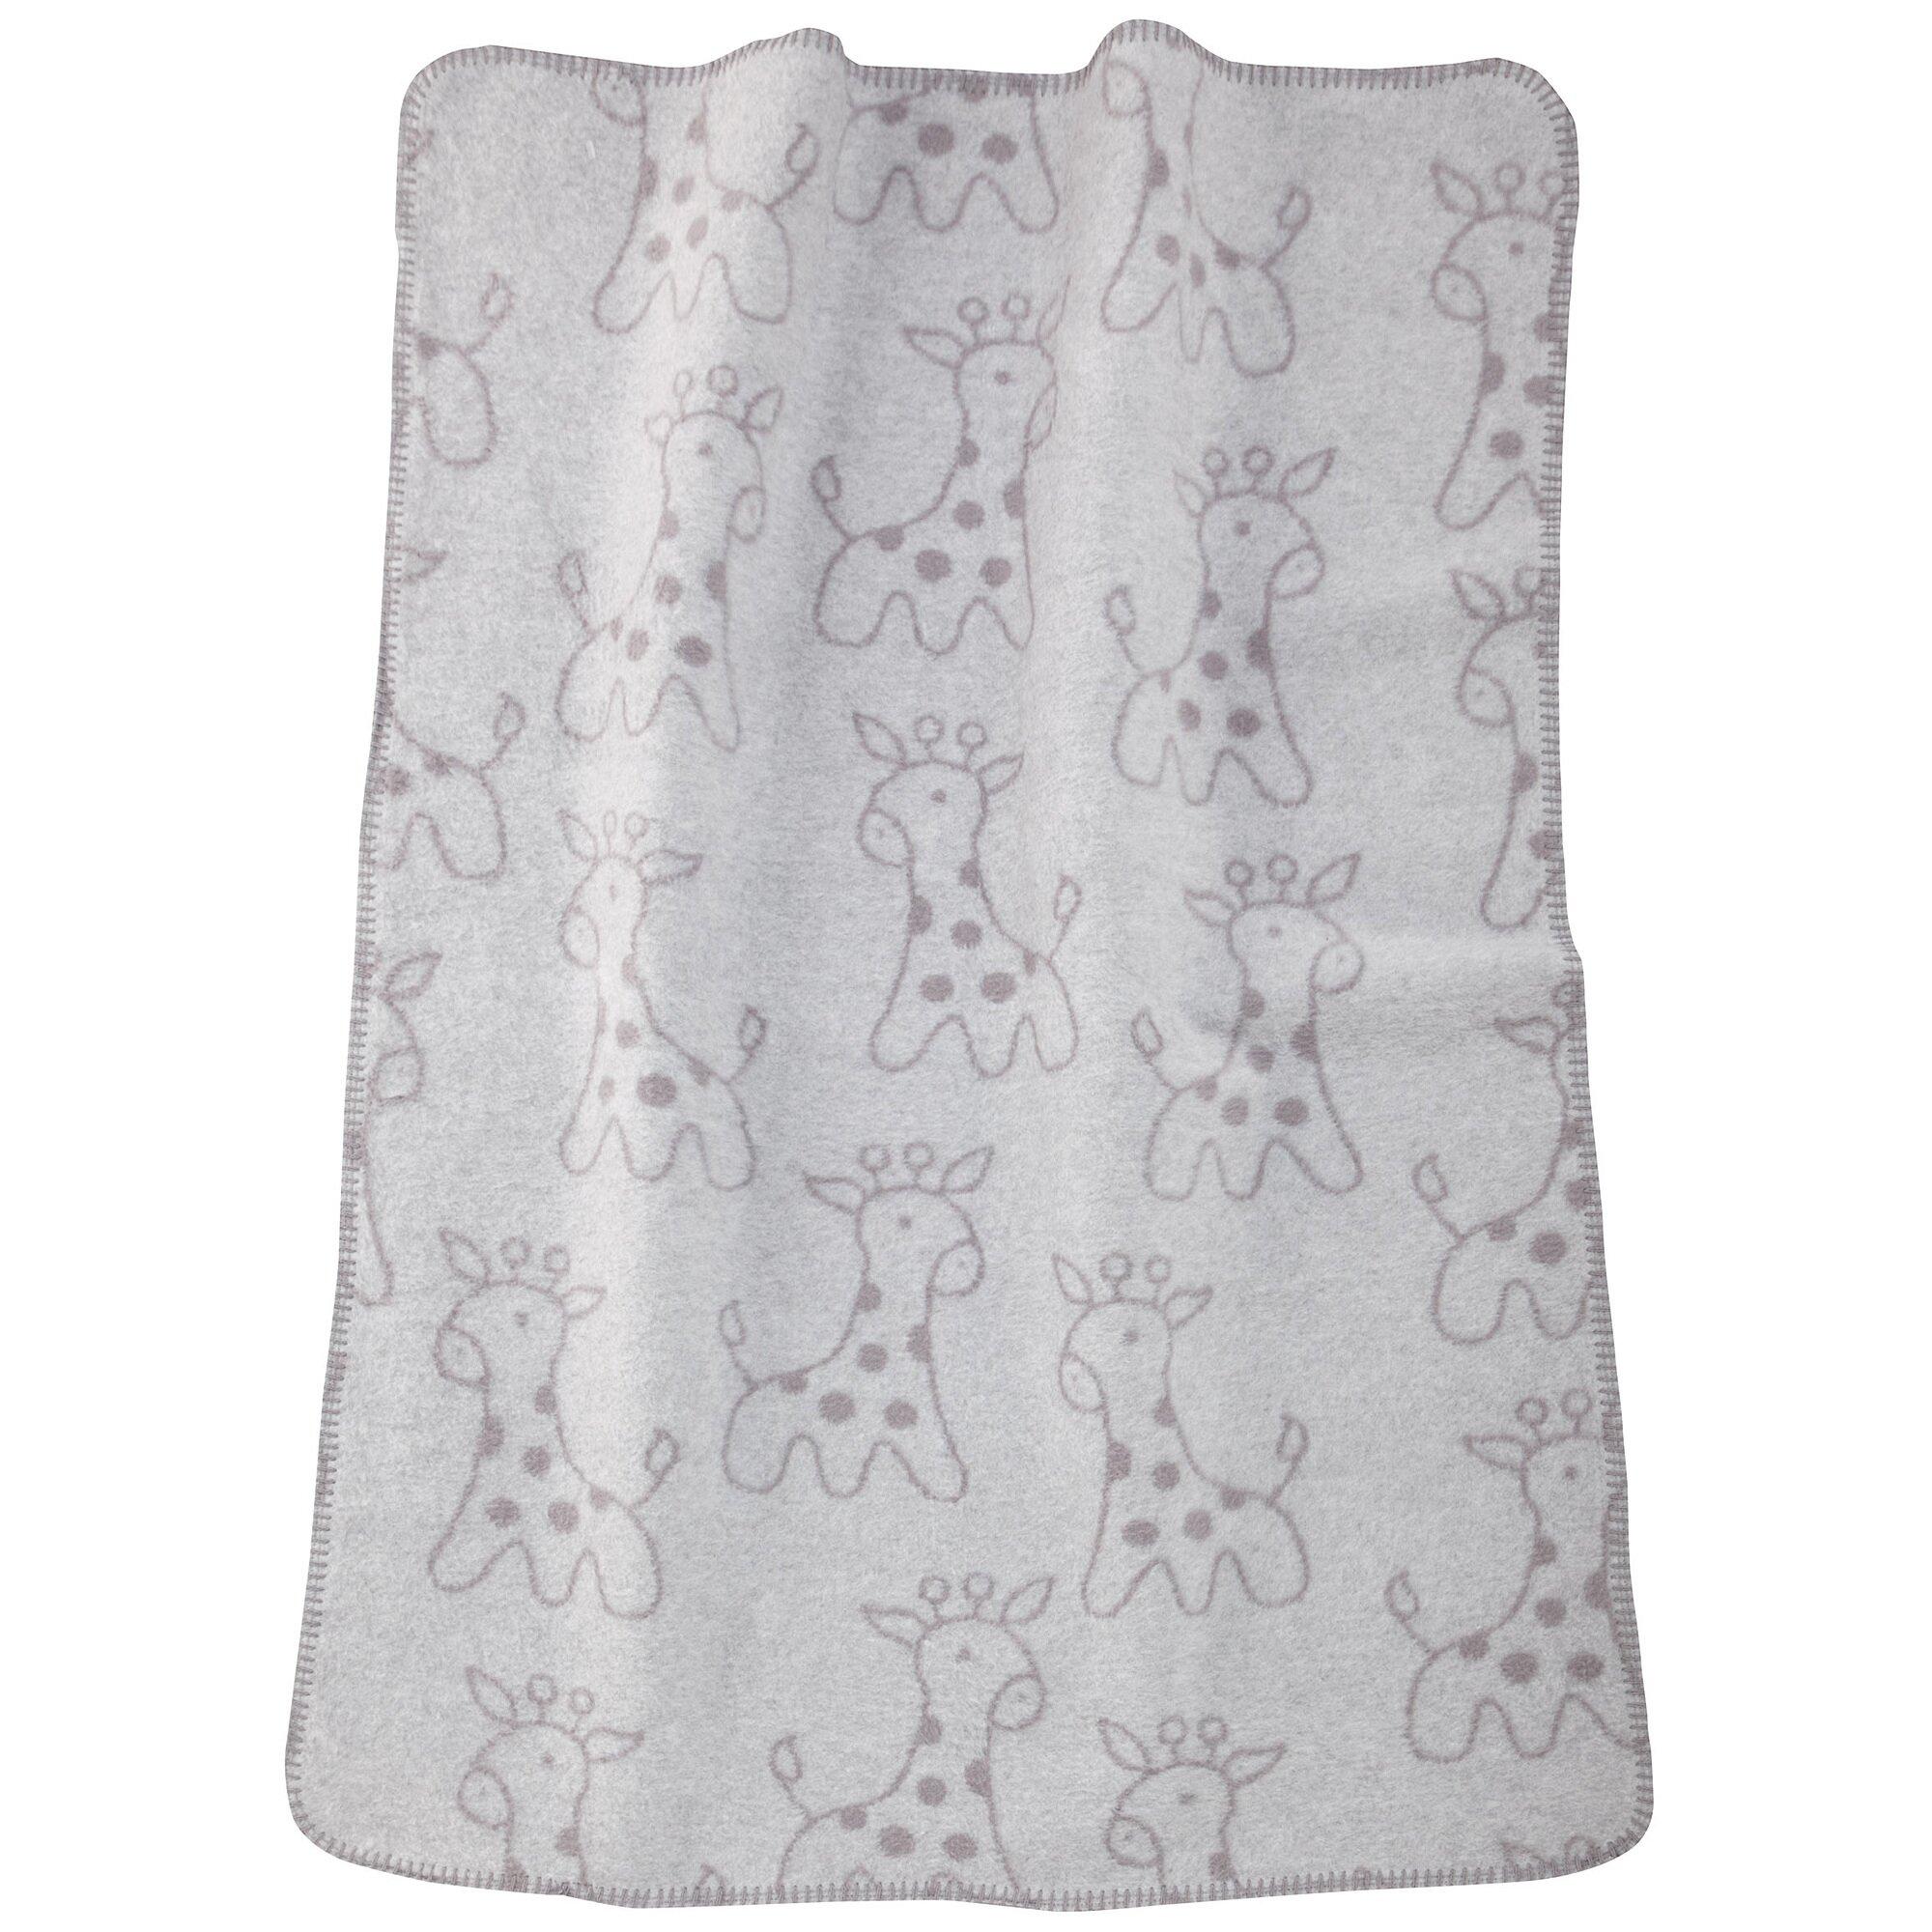 alvi-babydecke-giraffe-upf-50-75x100-cm-grau, 15.69 EUR @ babywalz-de